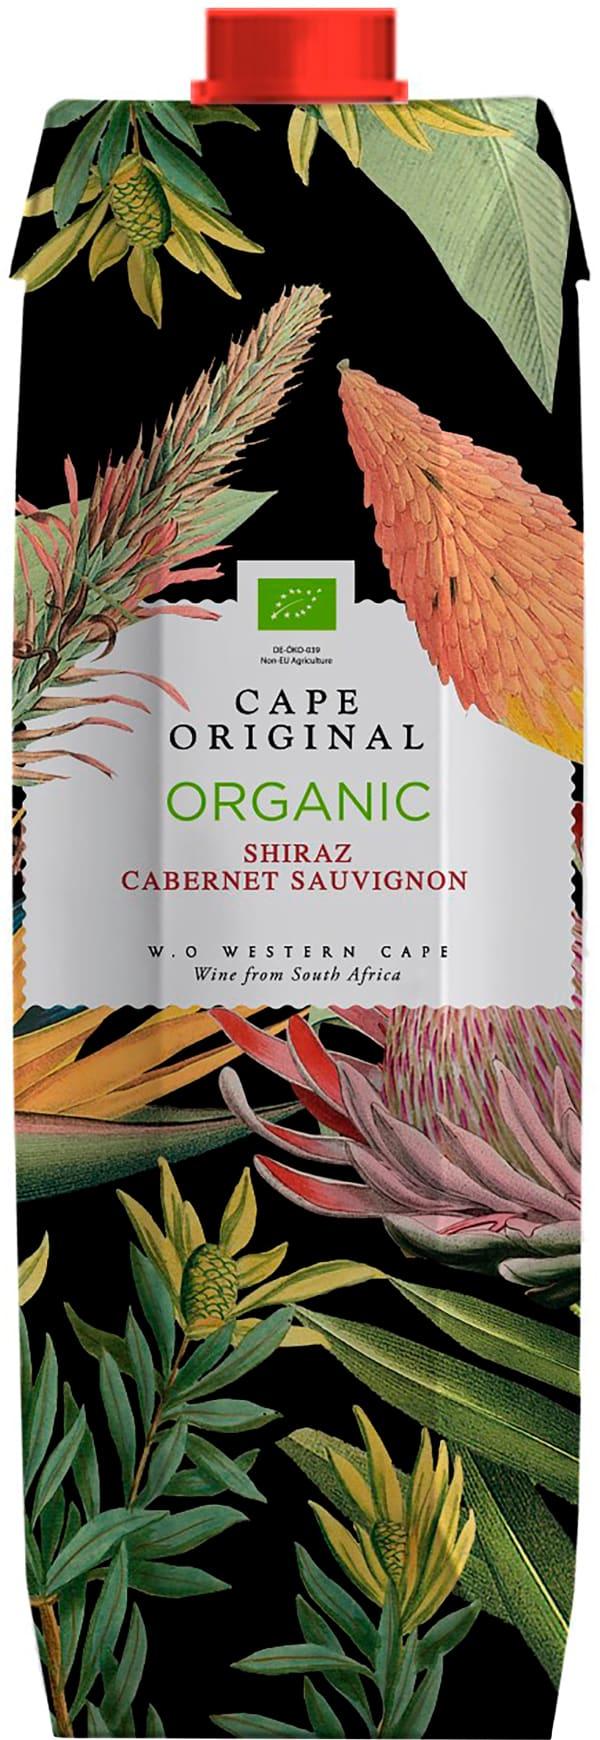 Cape Original Shiraz Cabernet Sauvignon Organic 2018 kartongförpackning